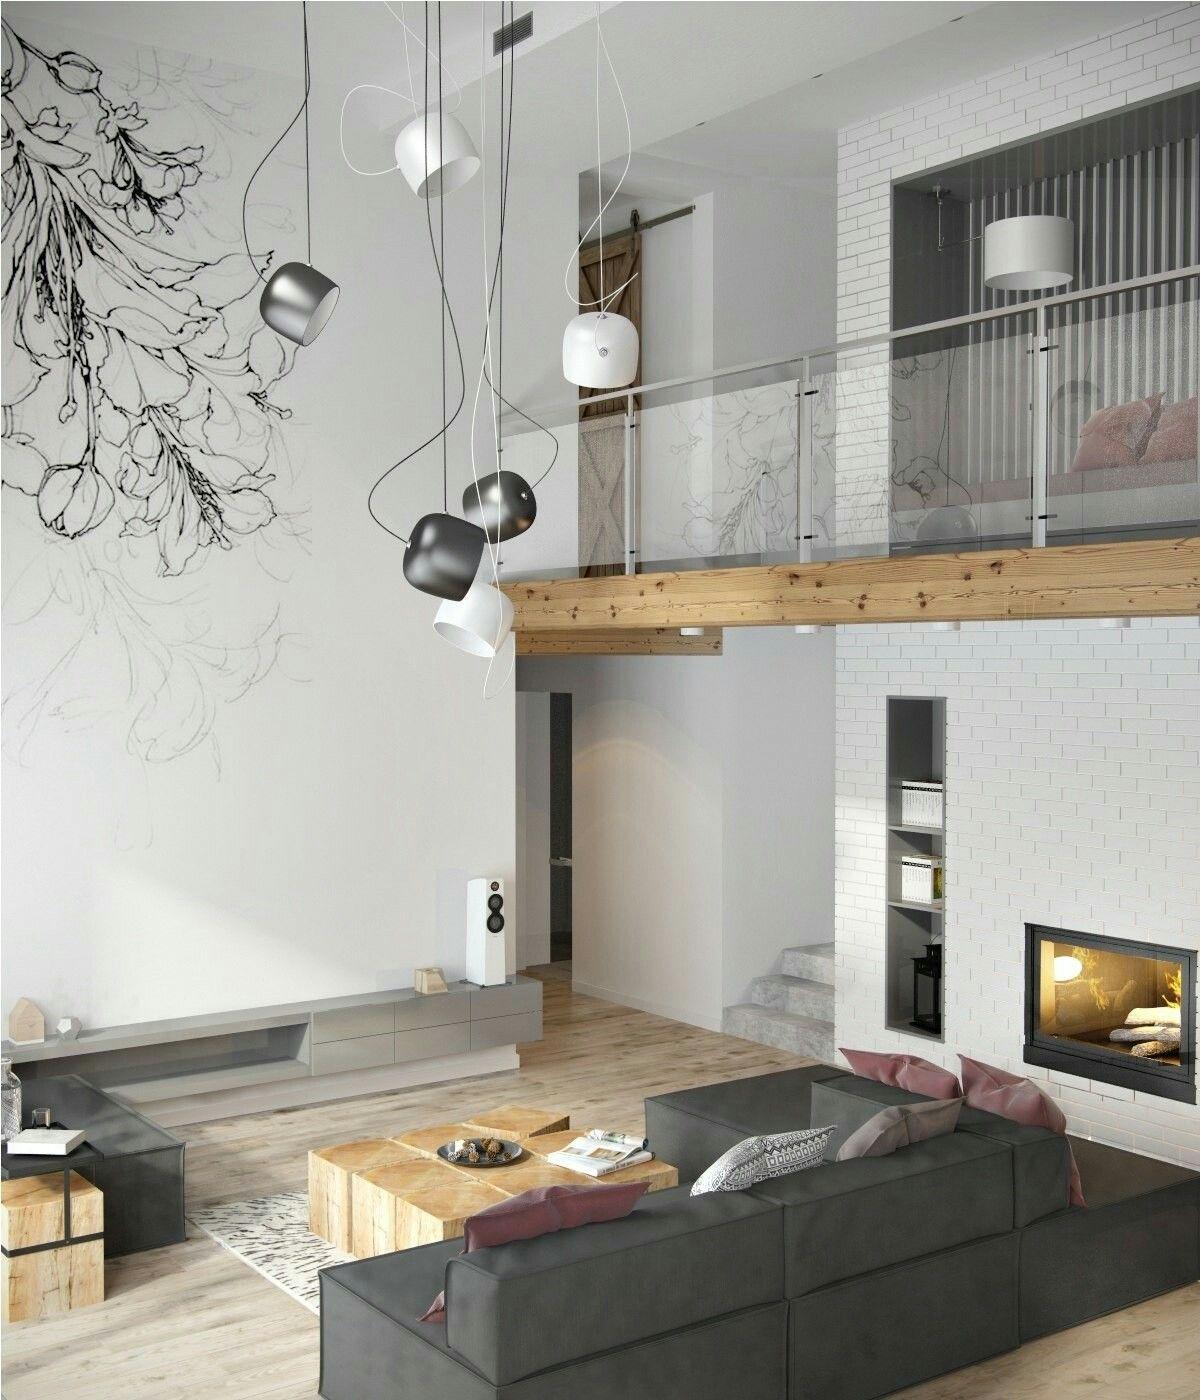 Pin von Martina Hollow auf boho home | Minimalist apartment, Living ...